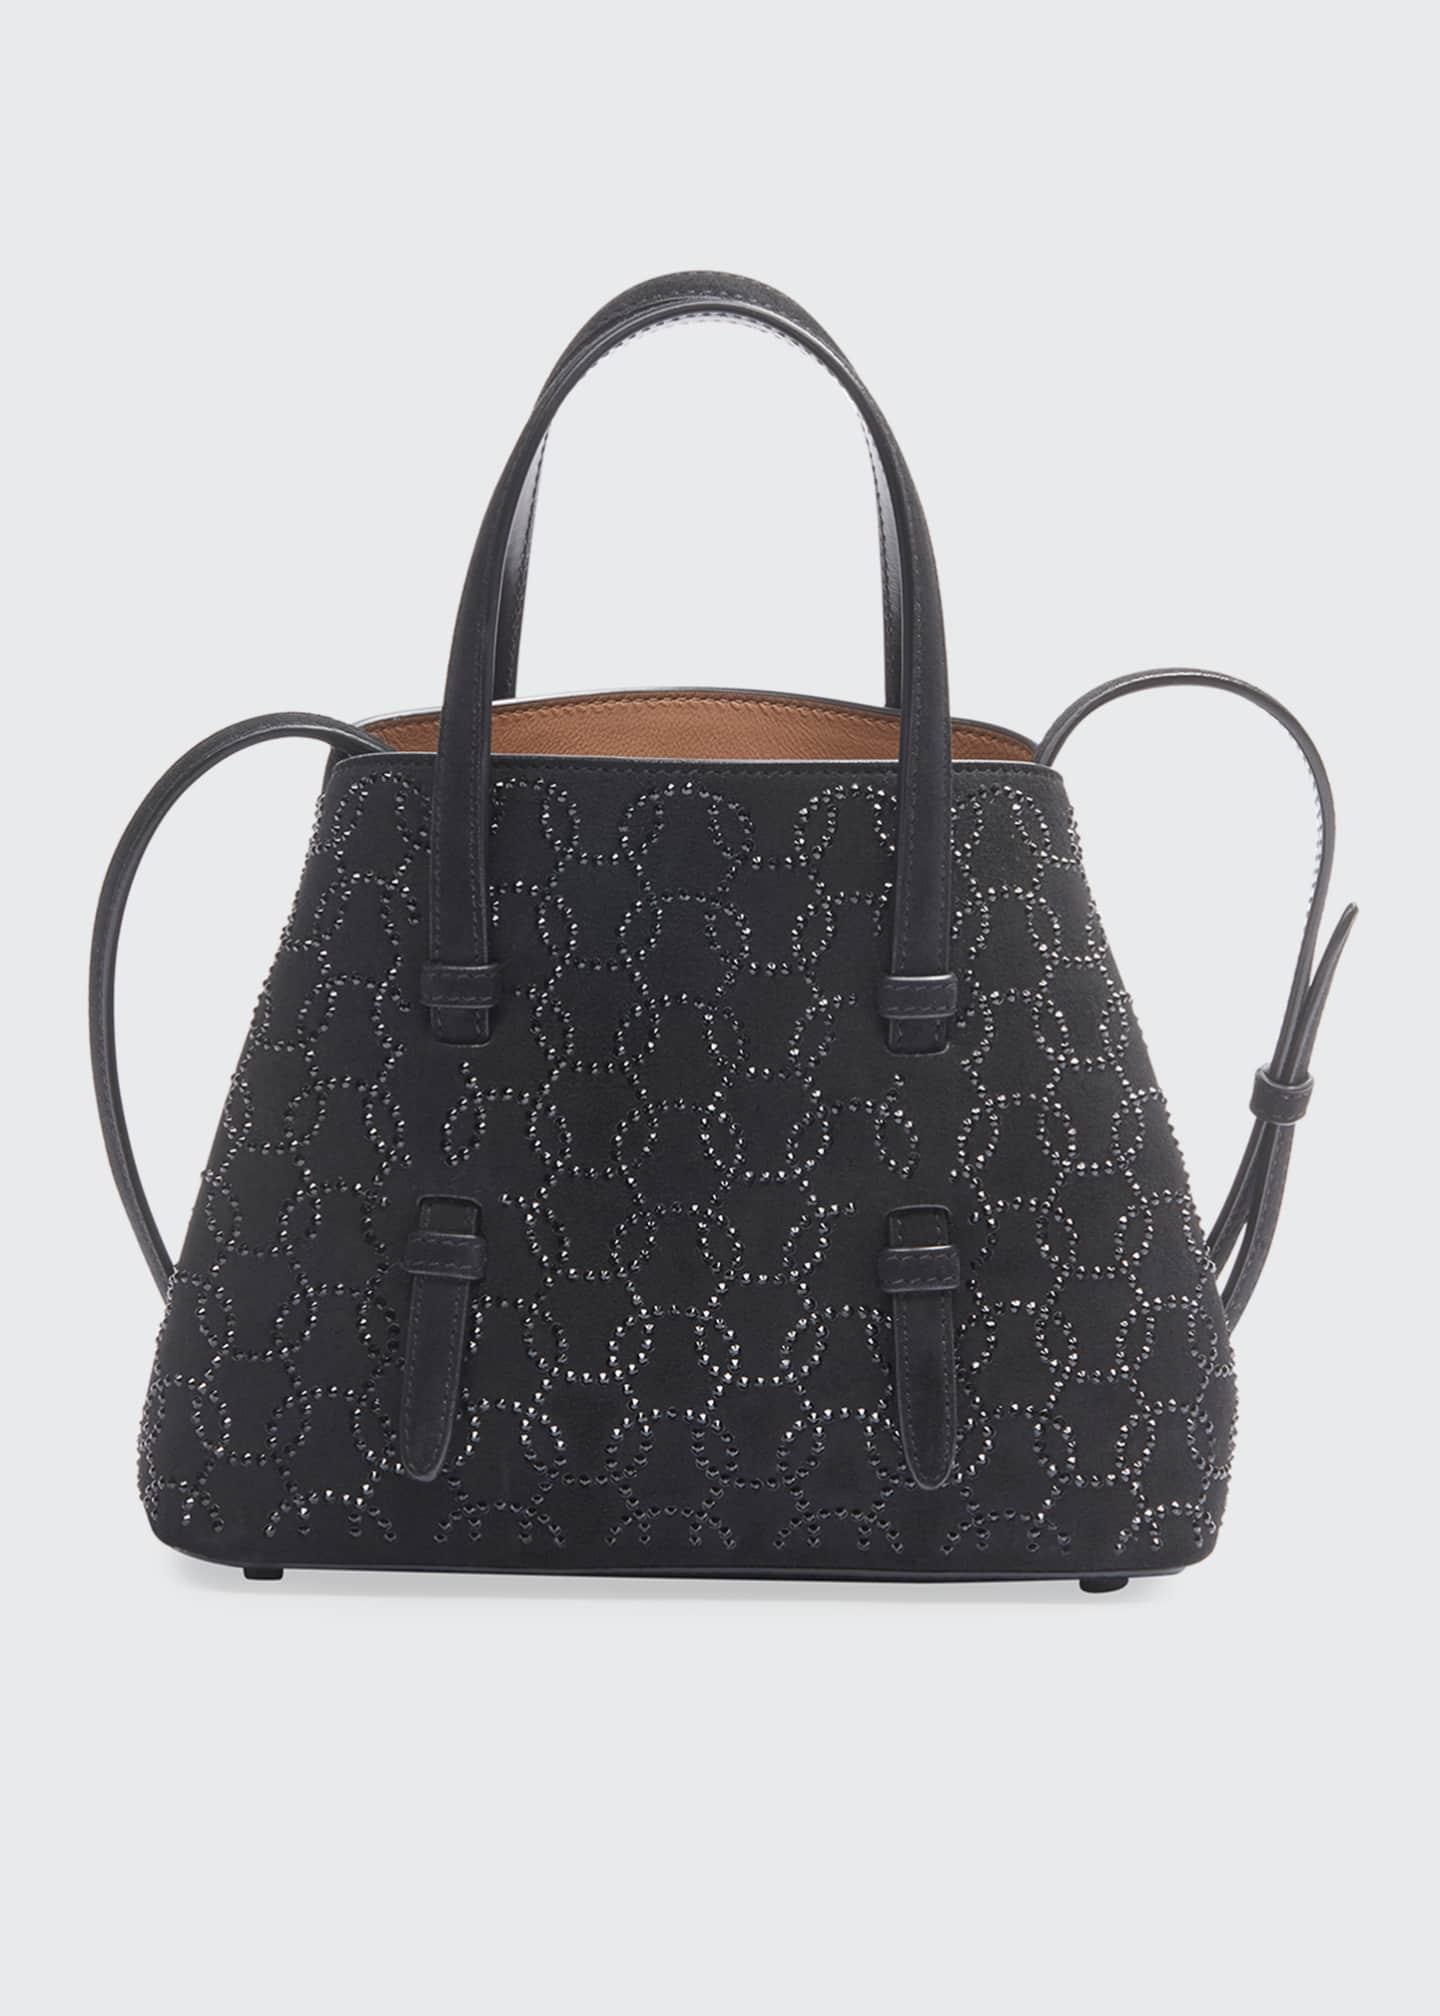 ALAIA Mina Mini Swarovski Crystal Tote Bag